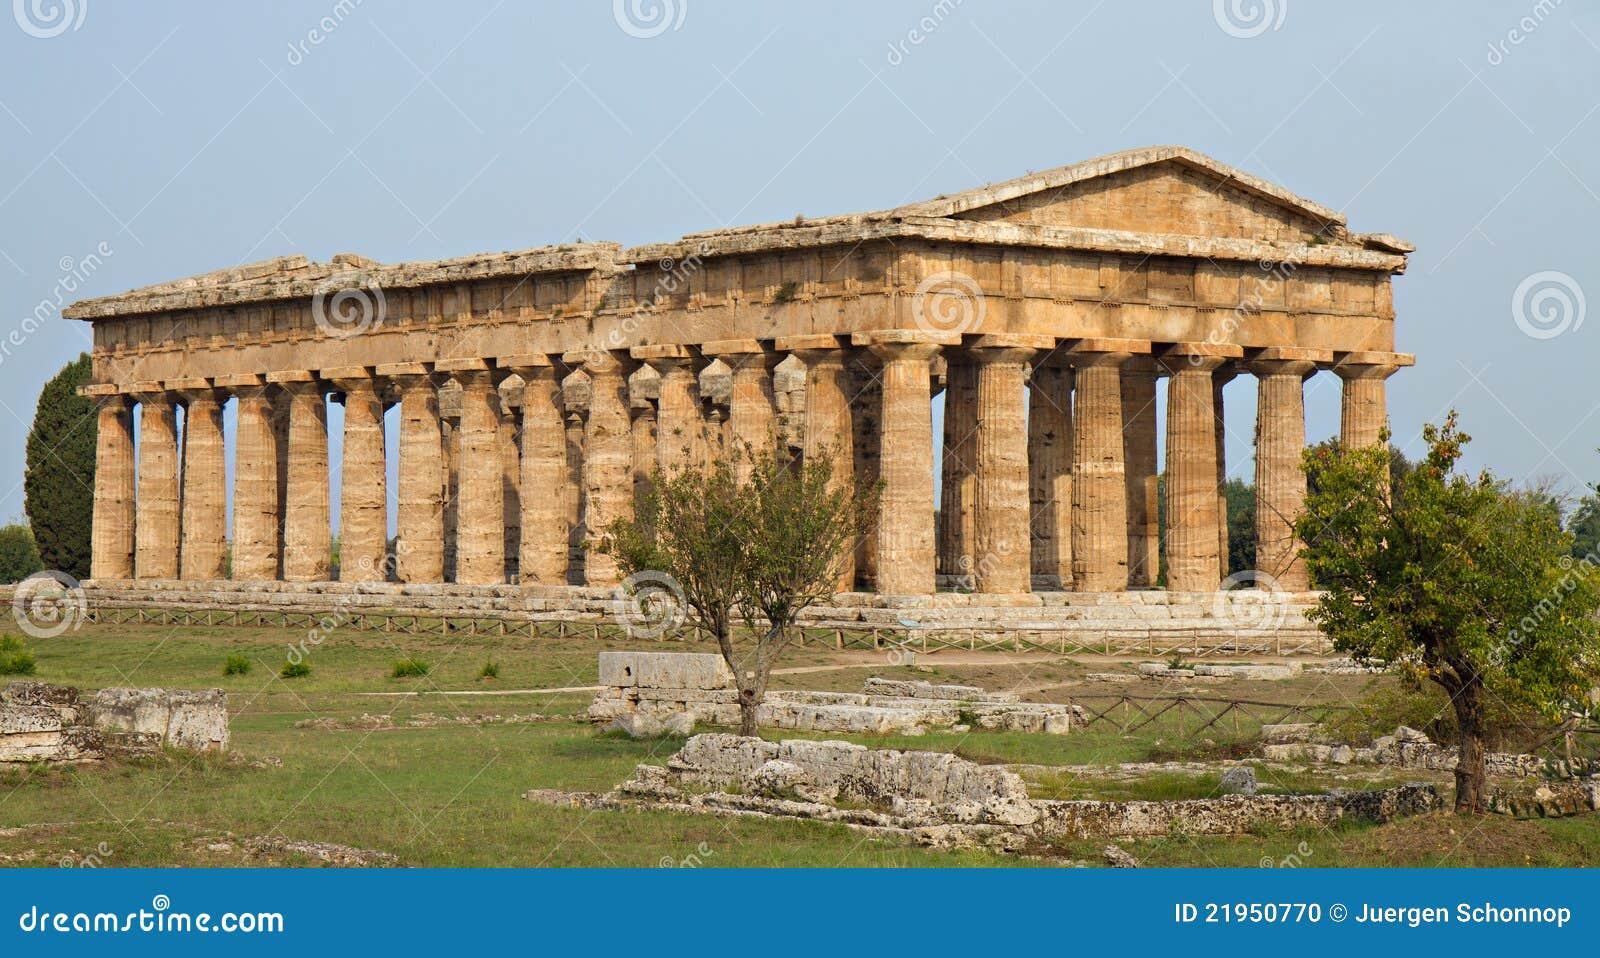 Ancient Greek Temple Of Poseidon Stock Photo - Image: 21950770